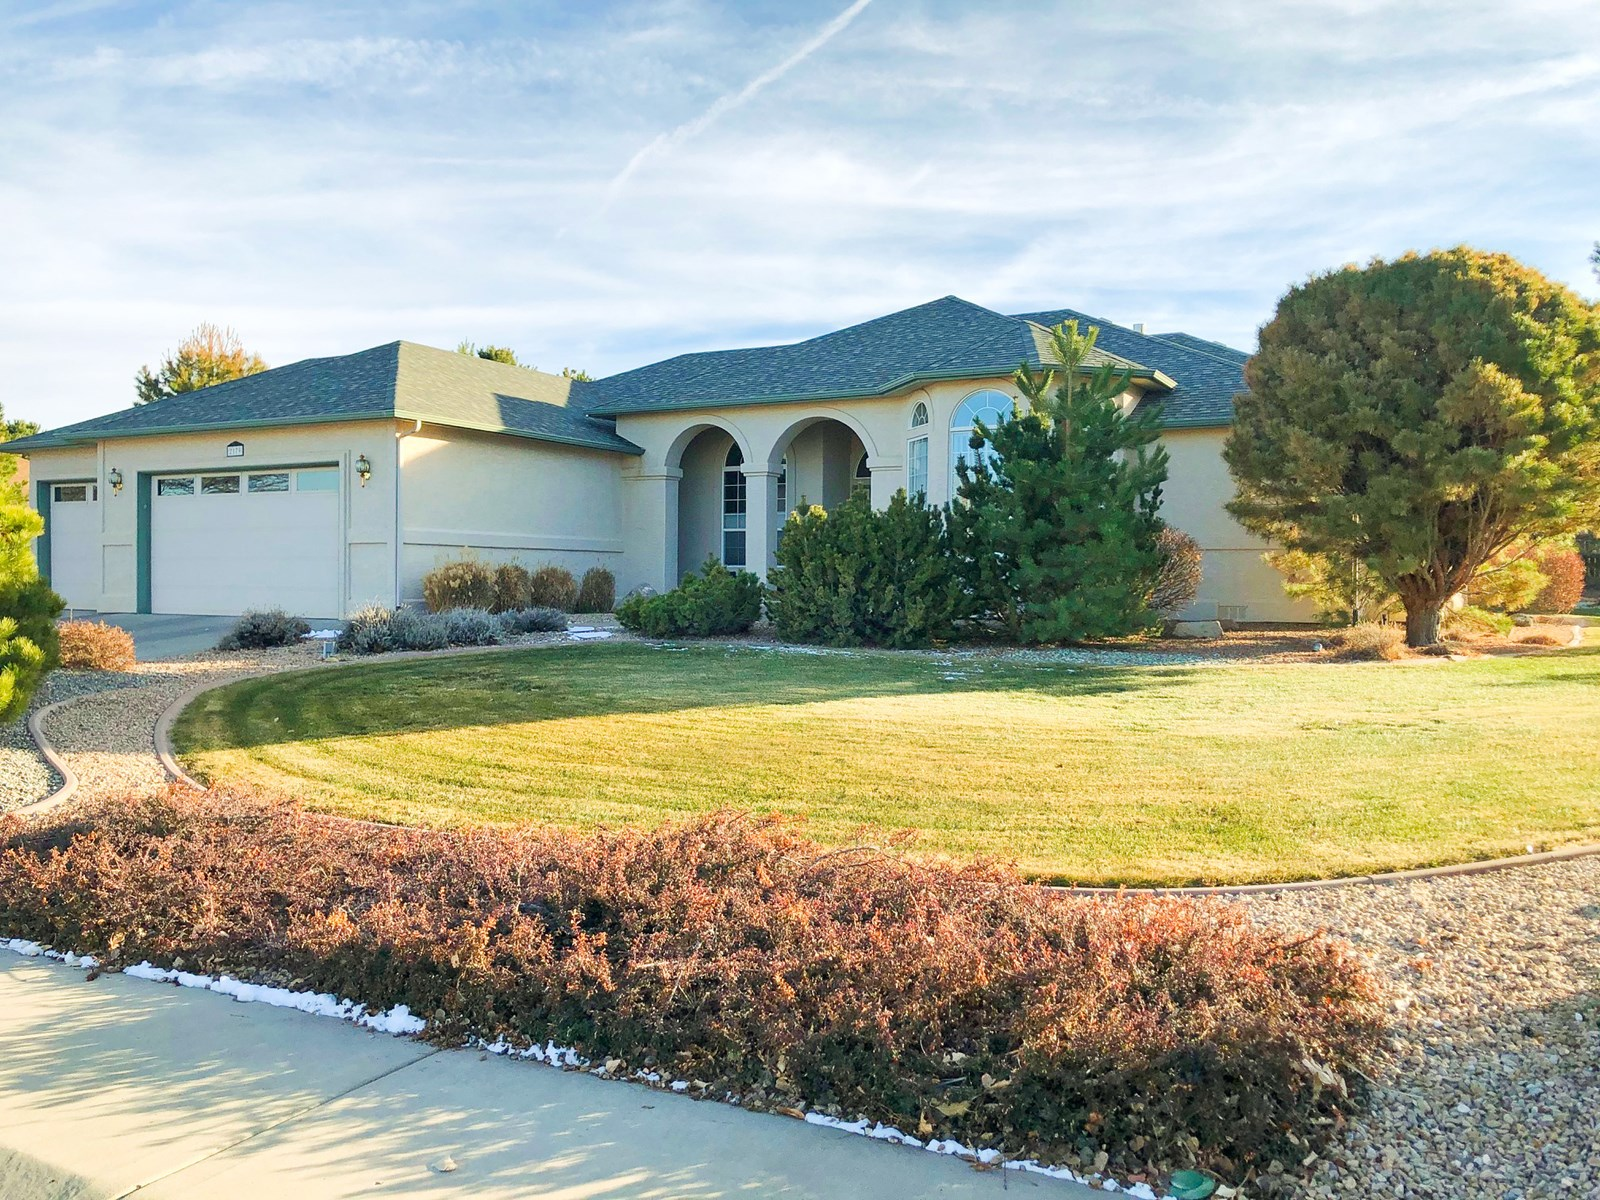 4 Bedroom Grand Junction, CO Home For Sale Real Estate